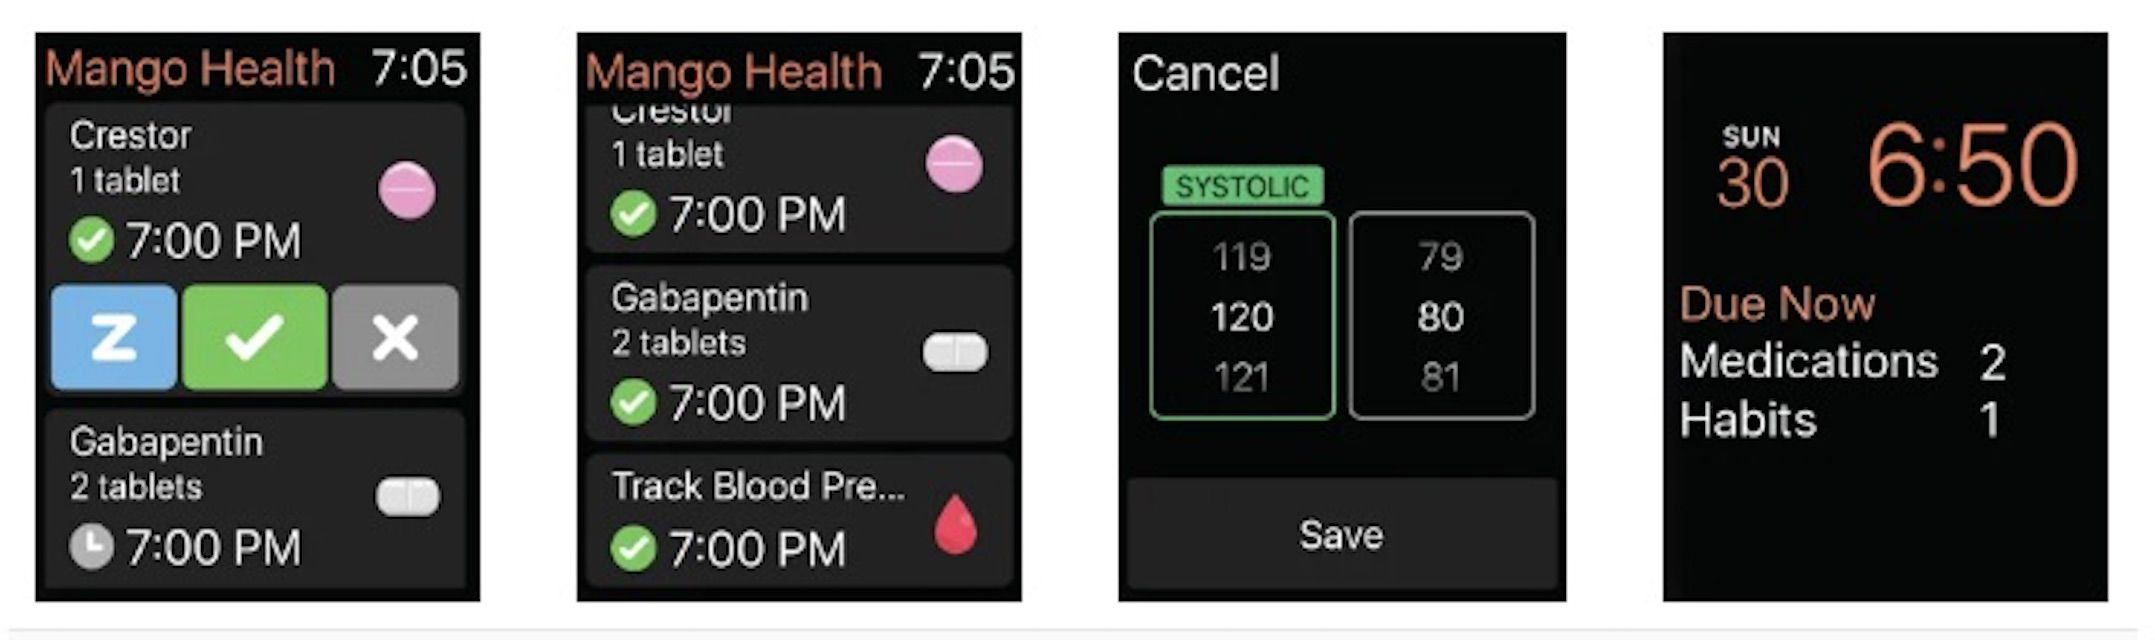 Mango Health medication reminder app for Apple Watch